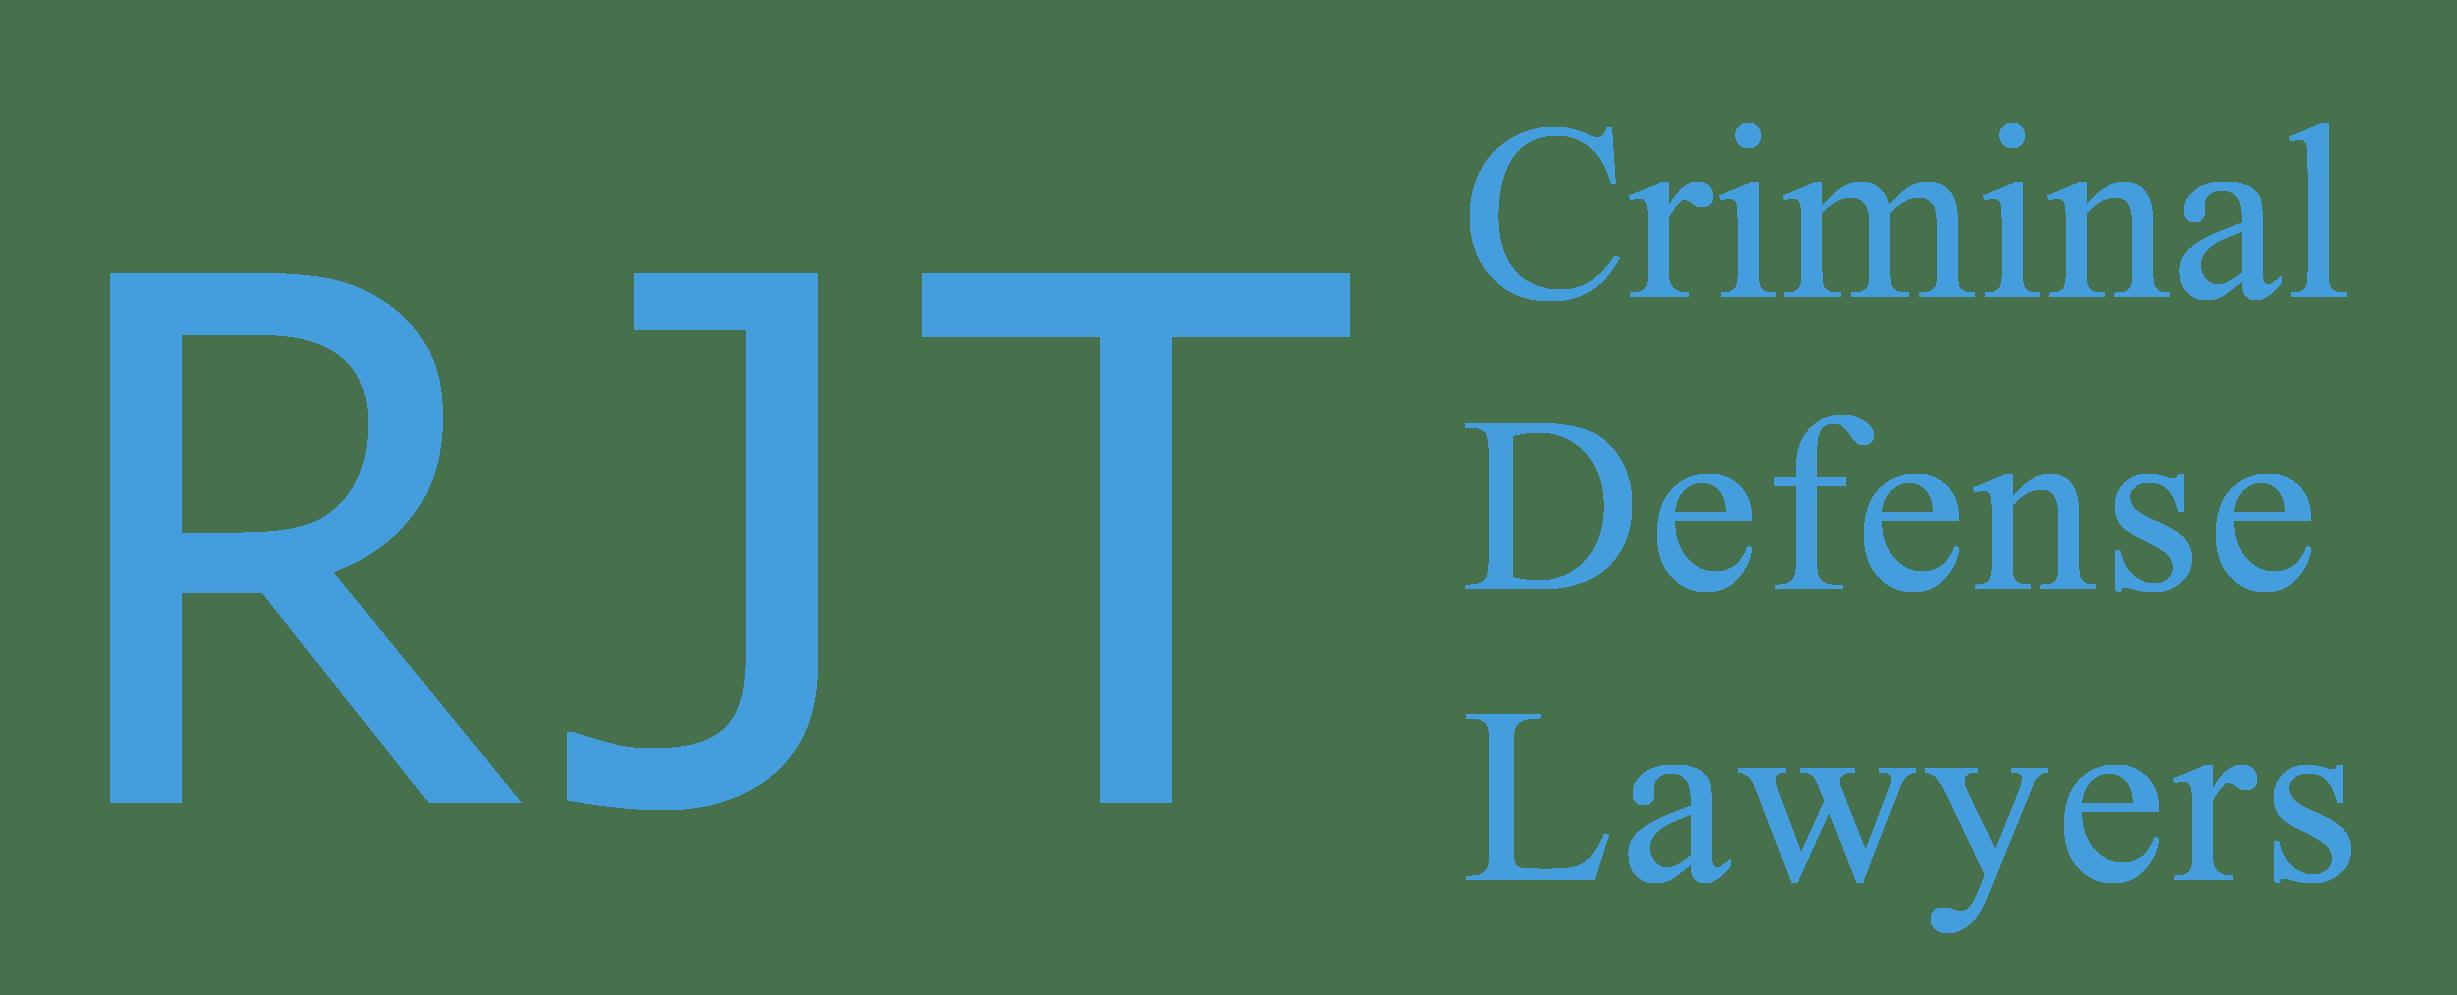 criminal defense essays Essays research papers - self-defense in criminal cases.